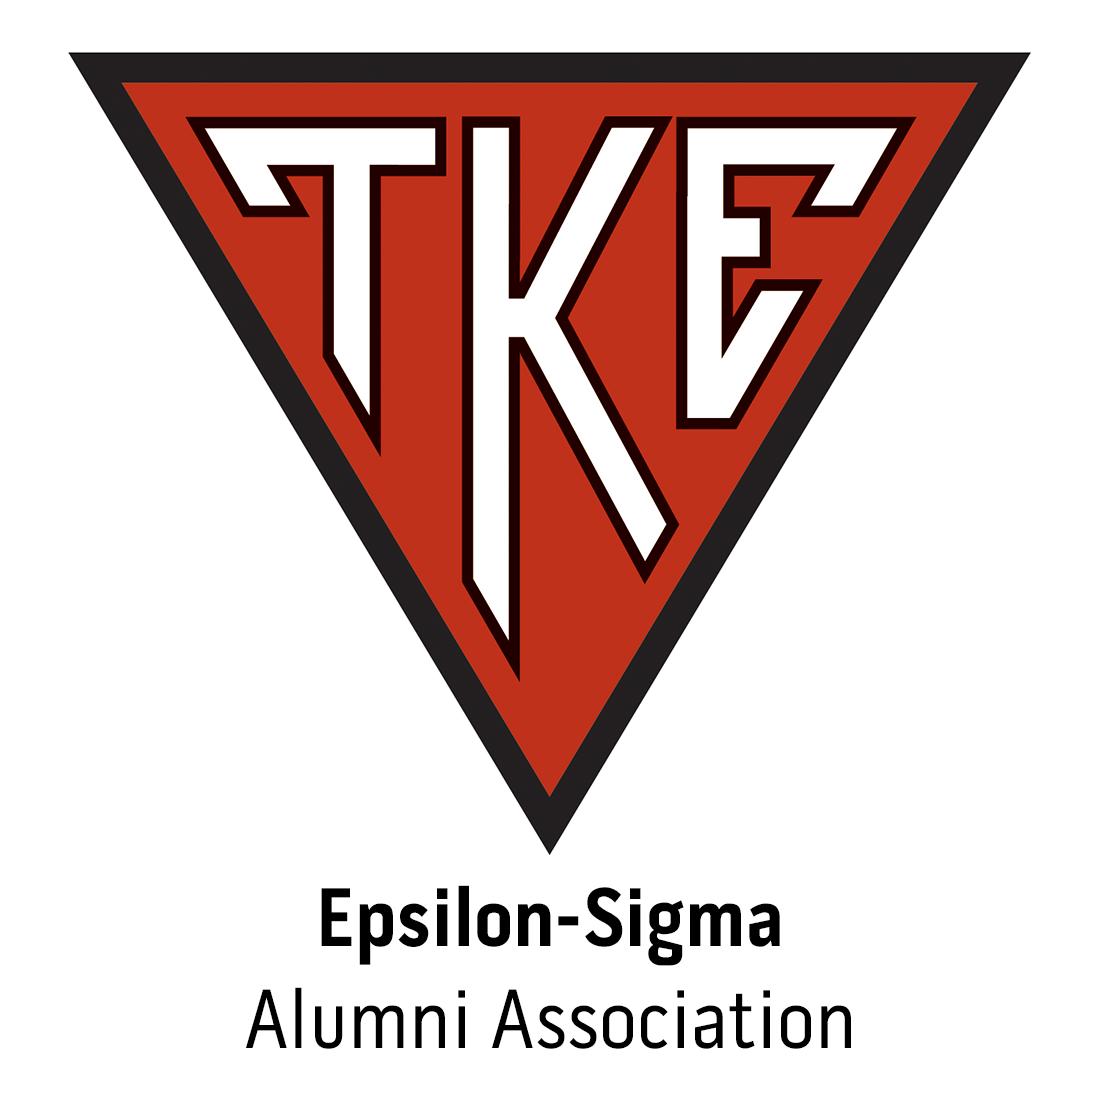 Epsilon-Sigma Alumni Association at University of Central Oklahoma